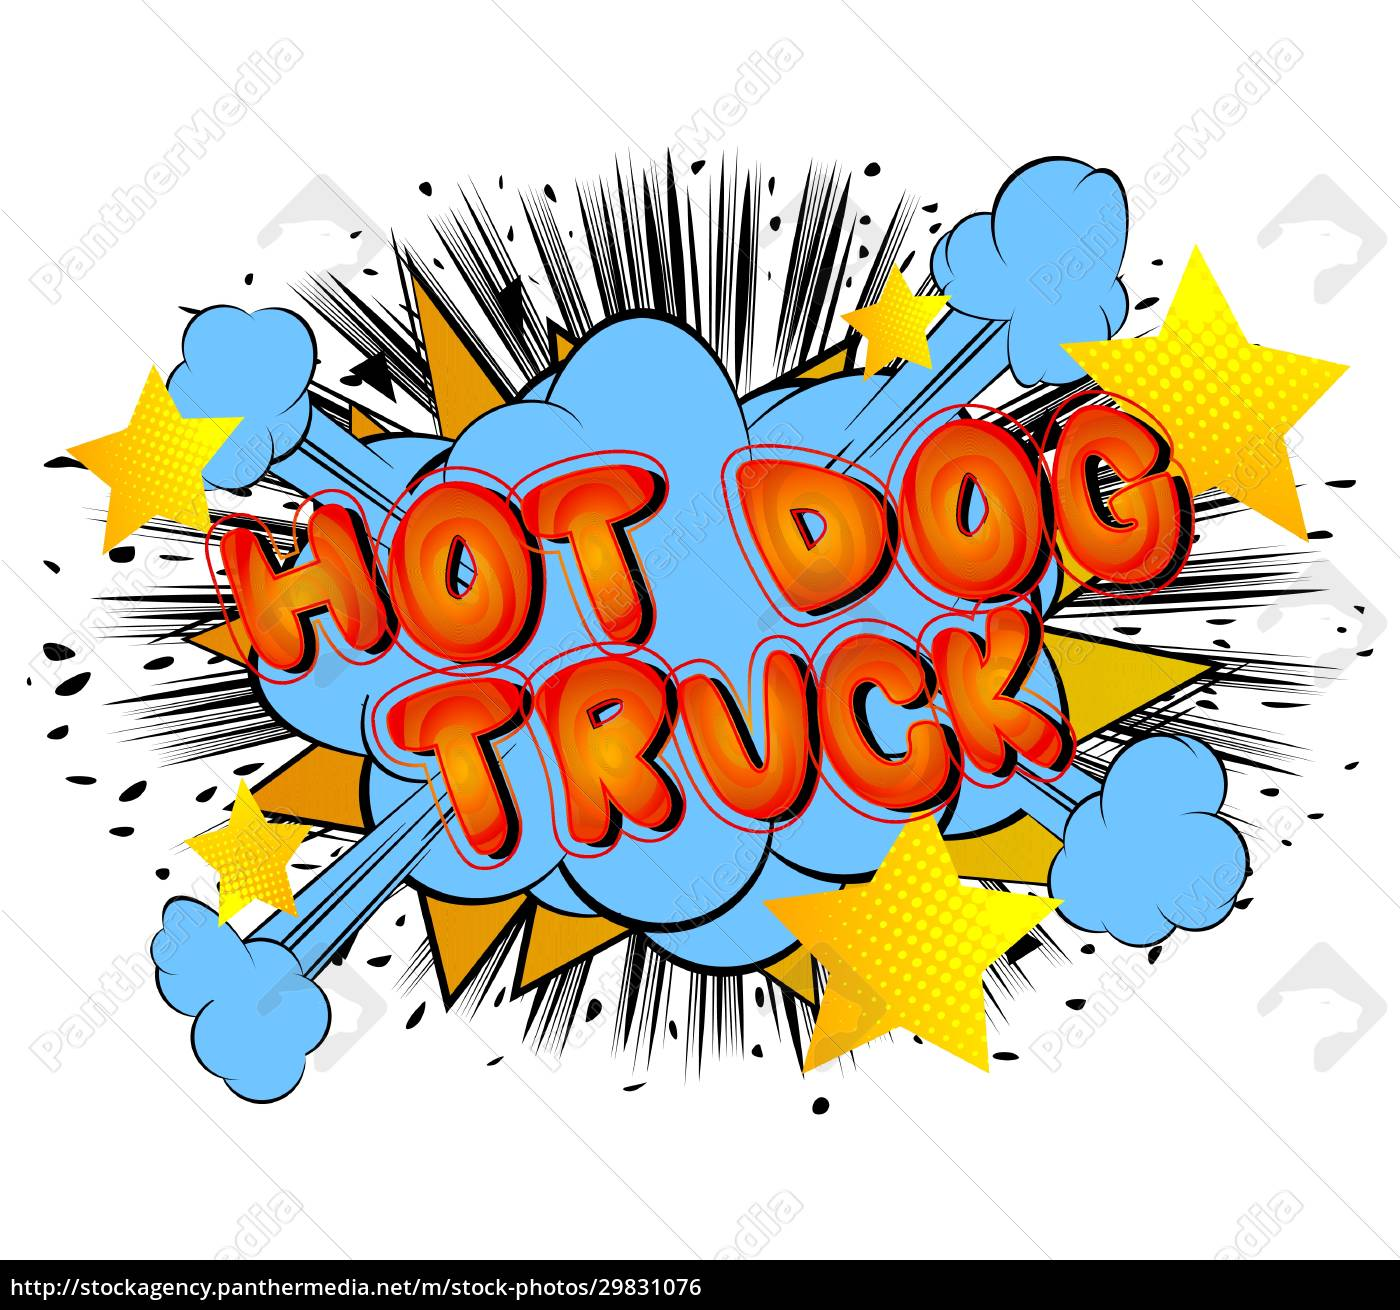 hot, dog, truck, -, comic, book - 29831076